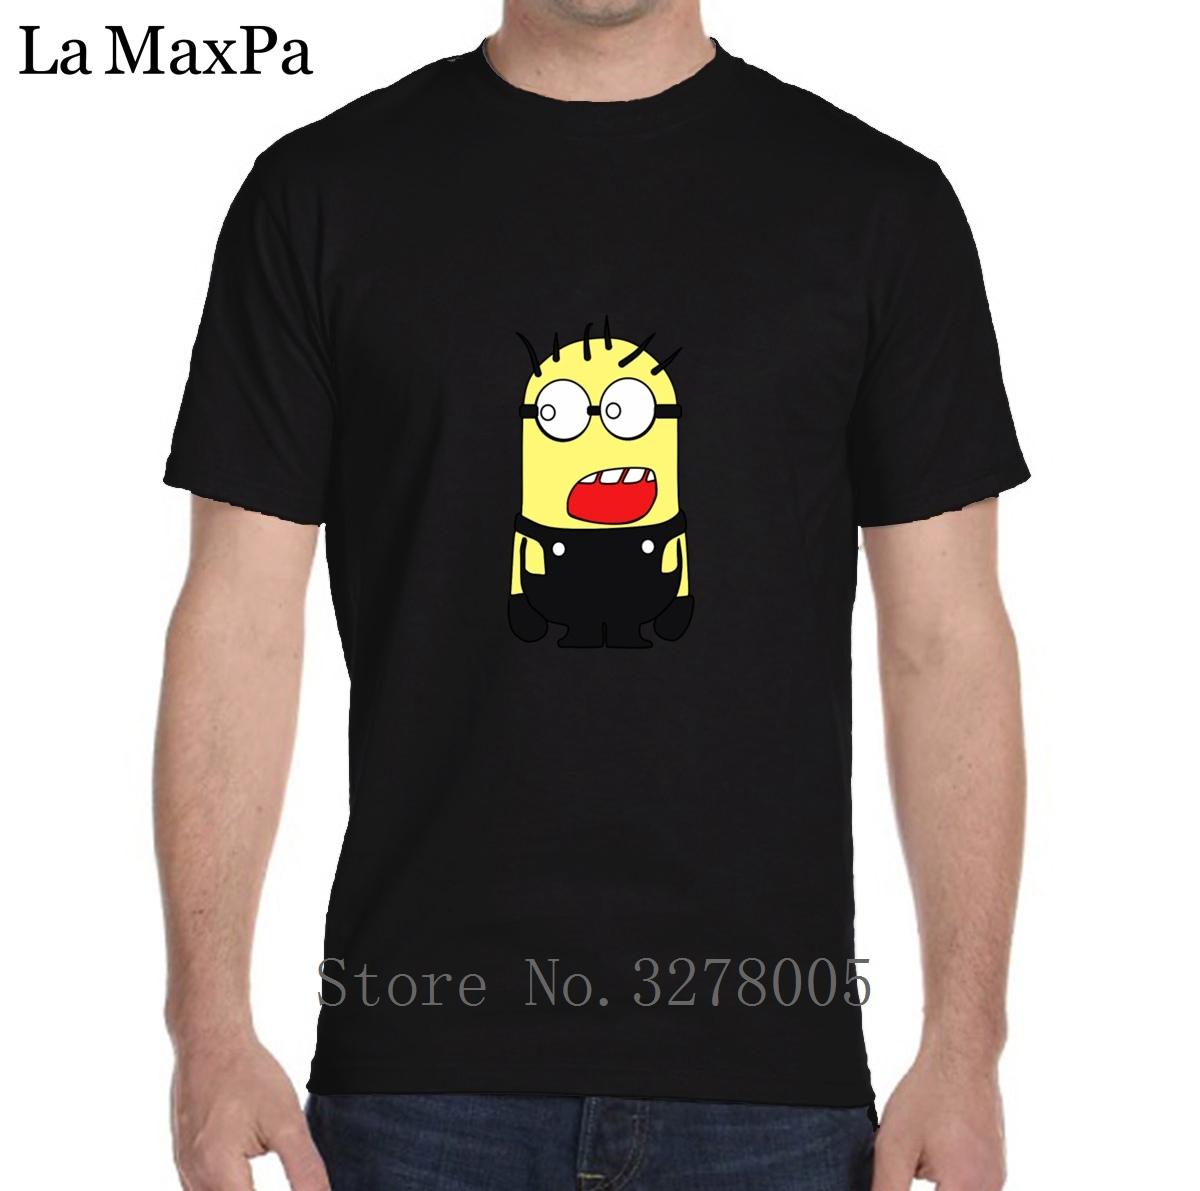 Designing T-Shirt Classic Minion T Shirt Men Letter Short Sleeve Cotton Men's Tshirt Sunlight O Neck Tee Shirt Homme Crazy